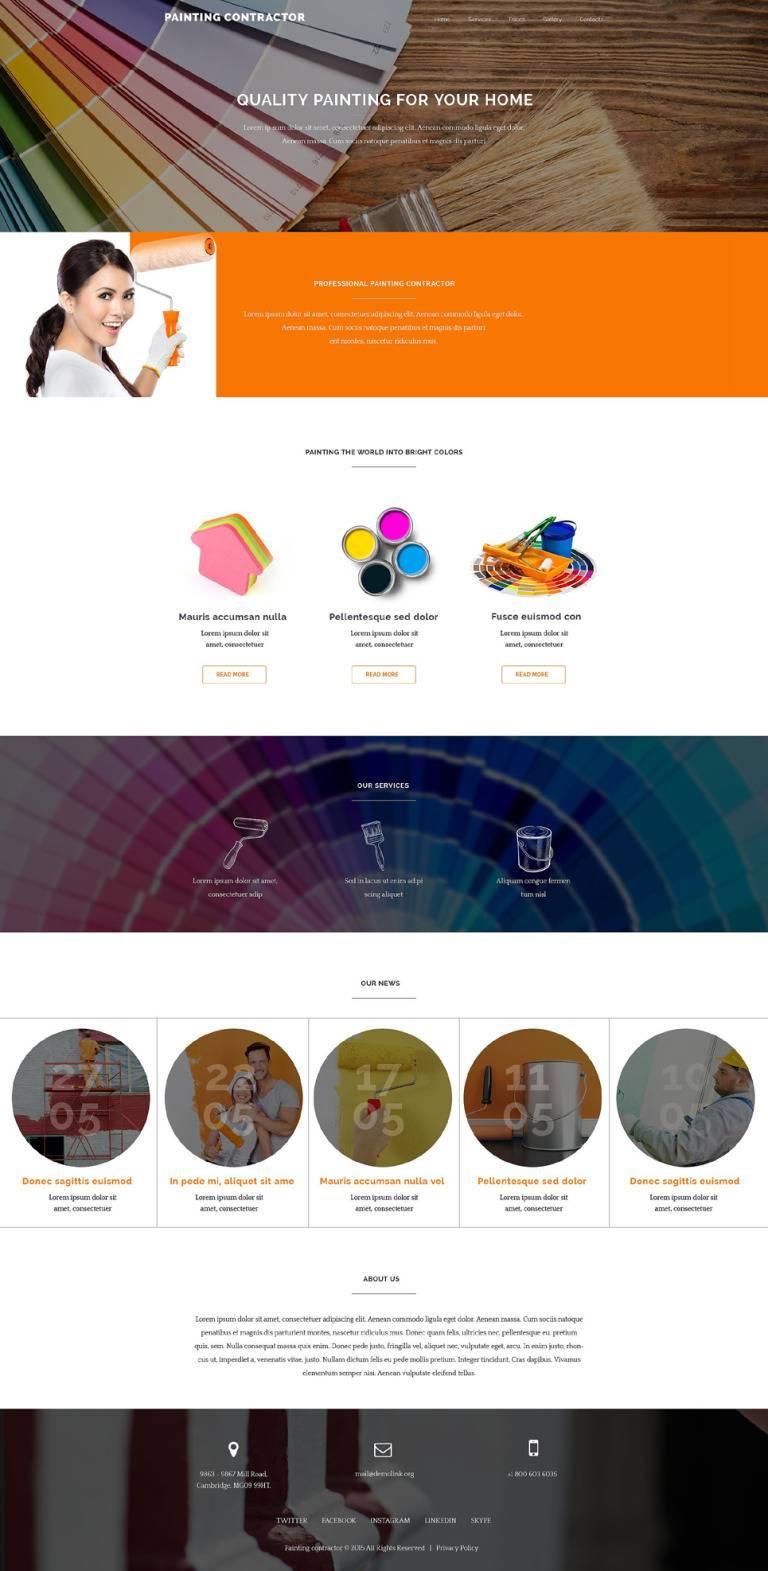 Painting Contractors Websites Templates